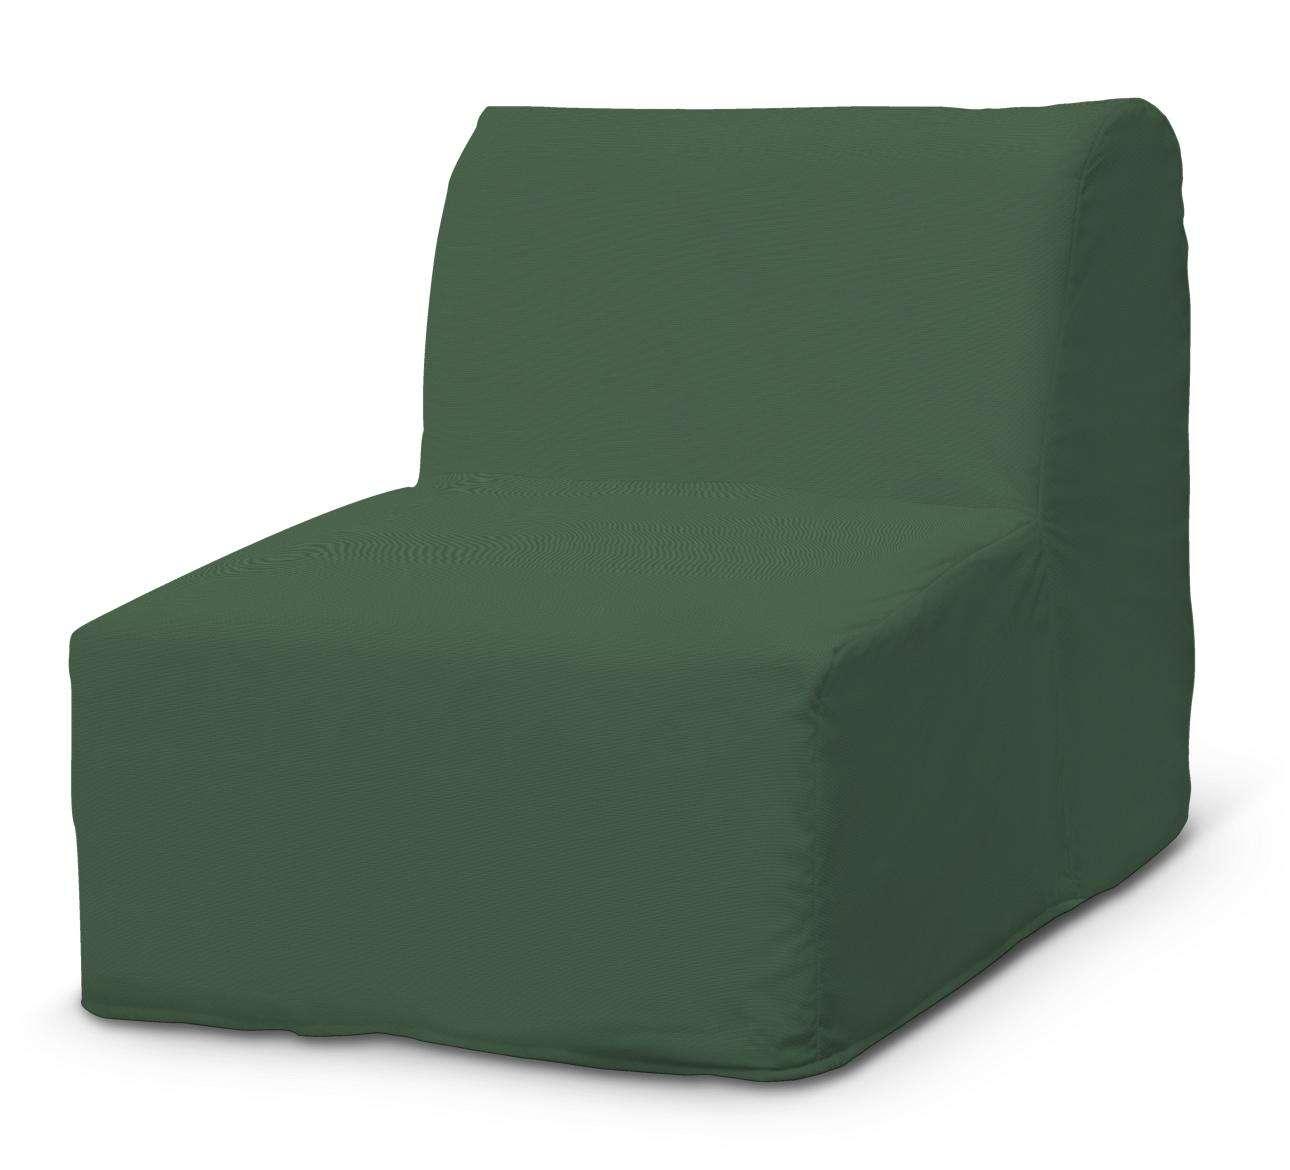 Pokrowiec na fotel Lycksele prosty fotel Lycksele w kolekcji Cotton Panama, tkanina: 702-06